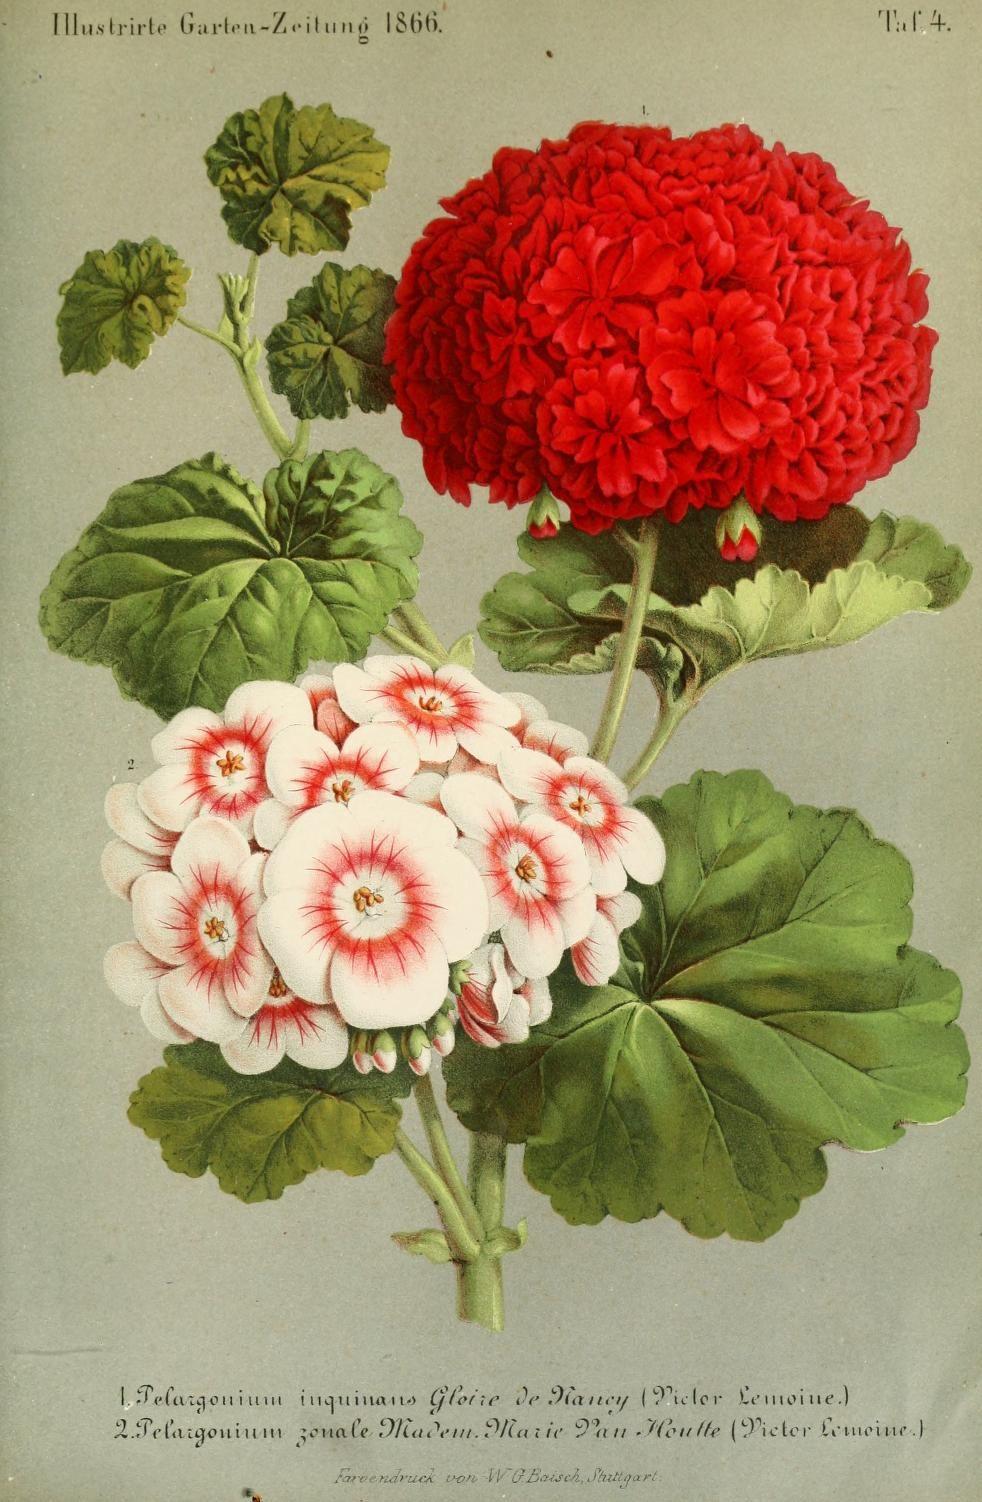 Bd 10 1866 Illustrierte Garten Zeitung Biodiversity Heritage Library Botanical Drawings Vintage Botanical Prints Botanical Illustration